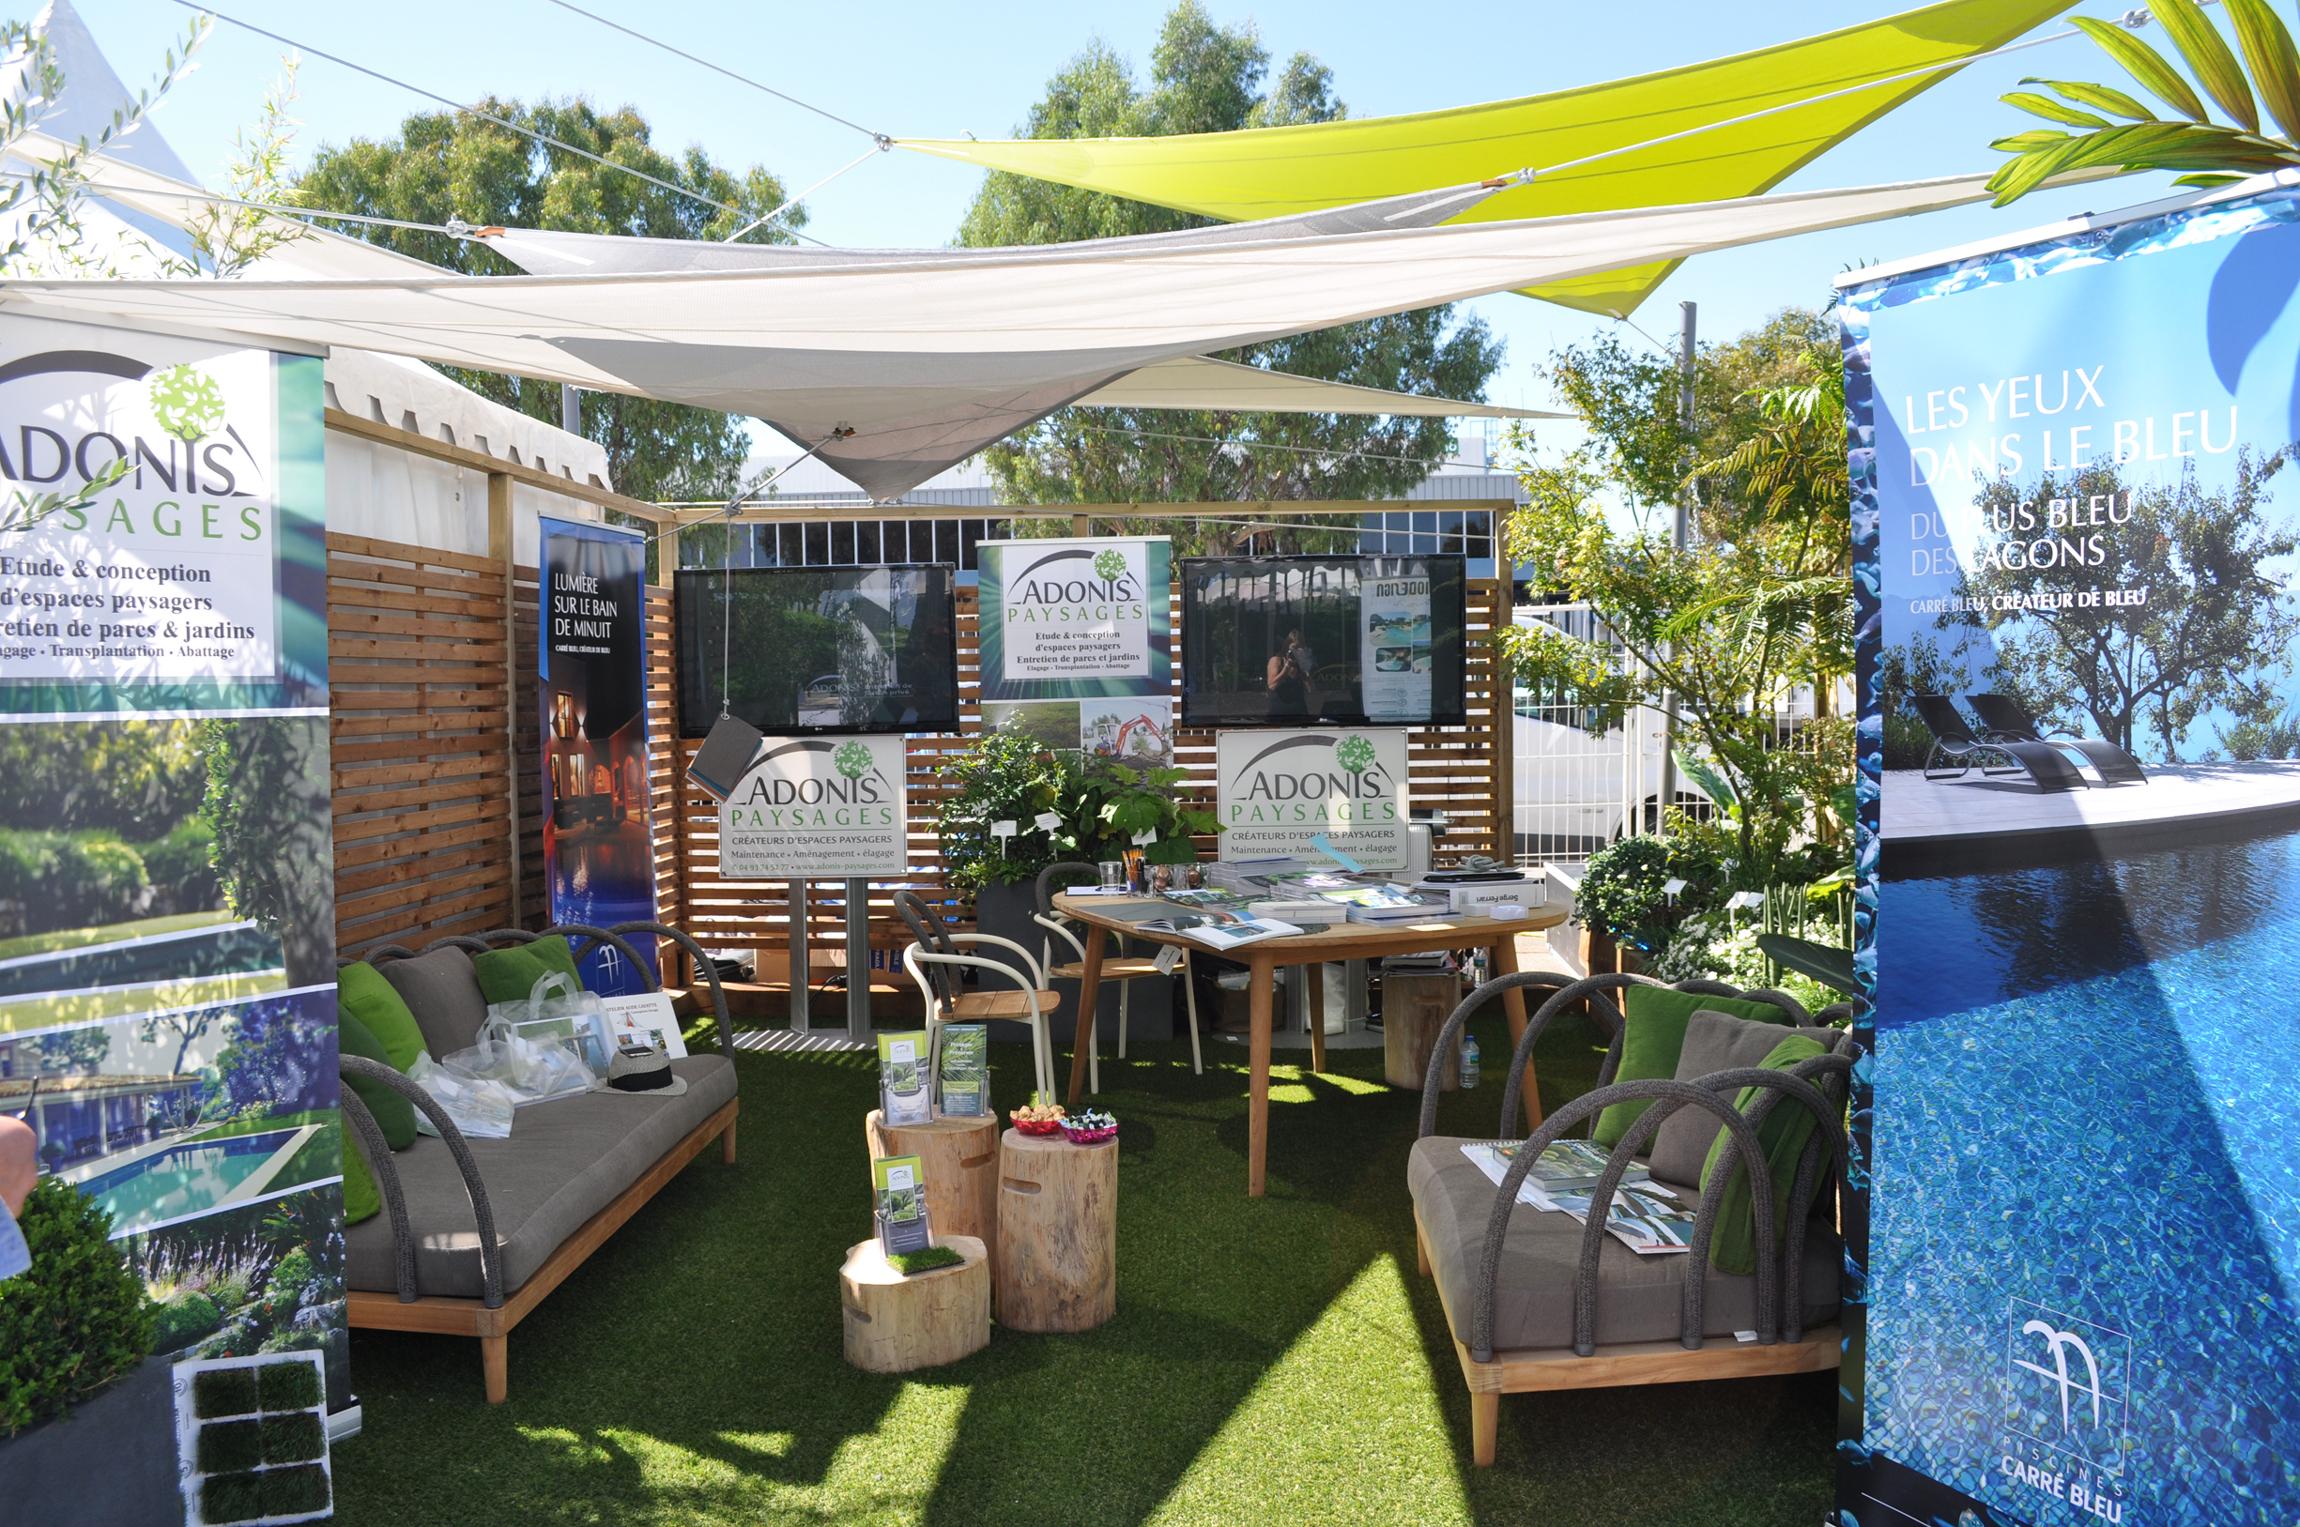 Septembre 2015 salon piscine spa jardin adonis paysages for Salon piscine et jardin